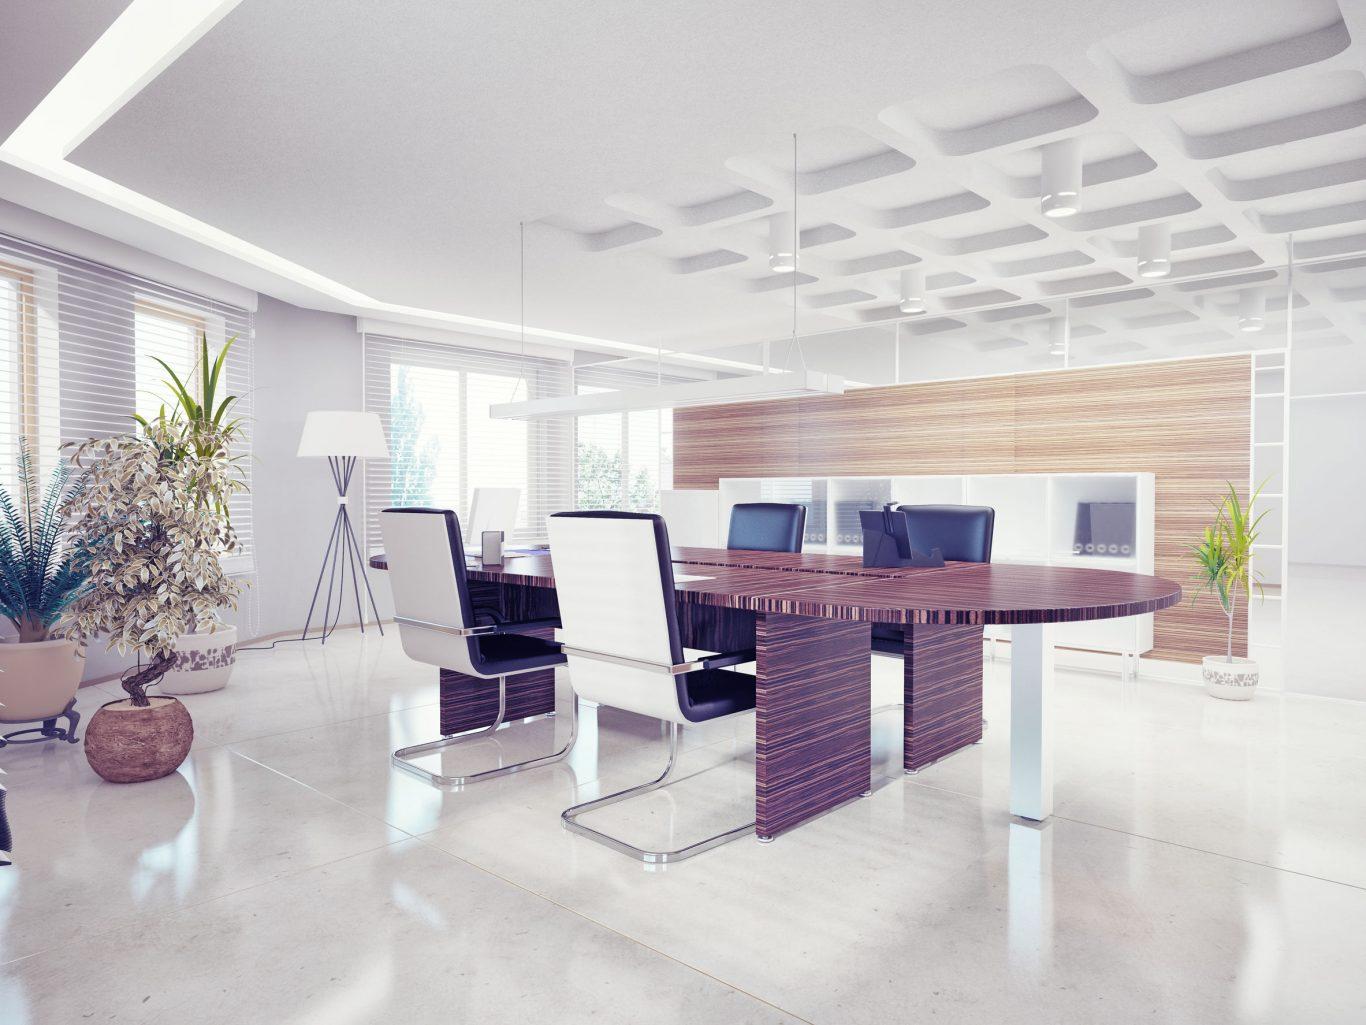 oficina baldosa